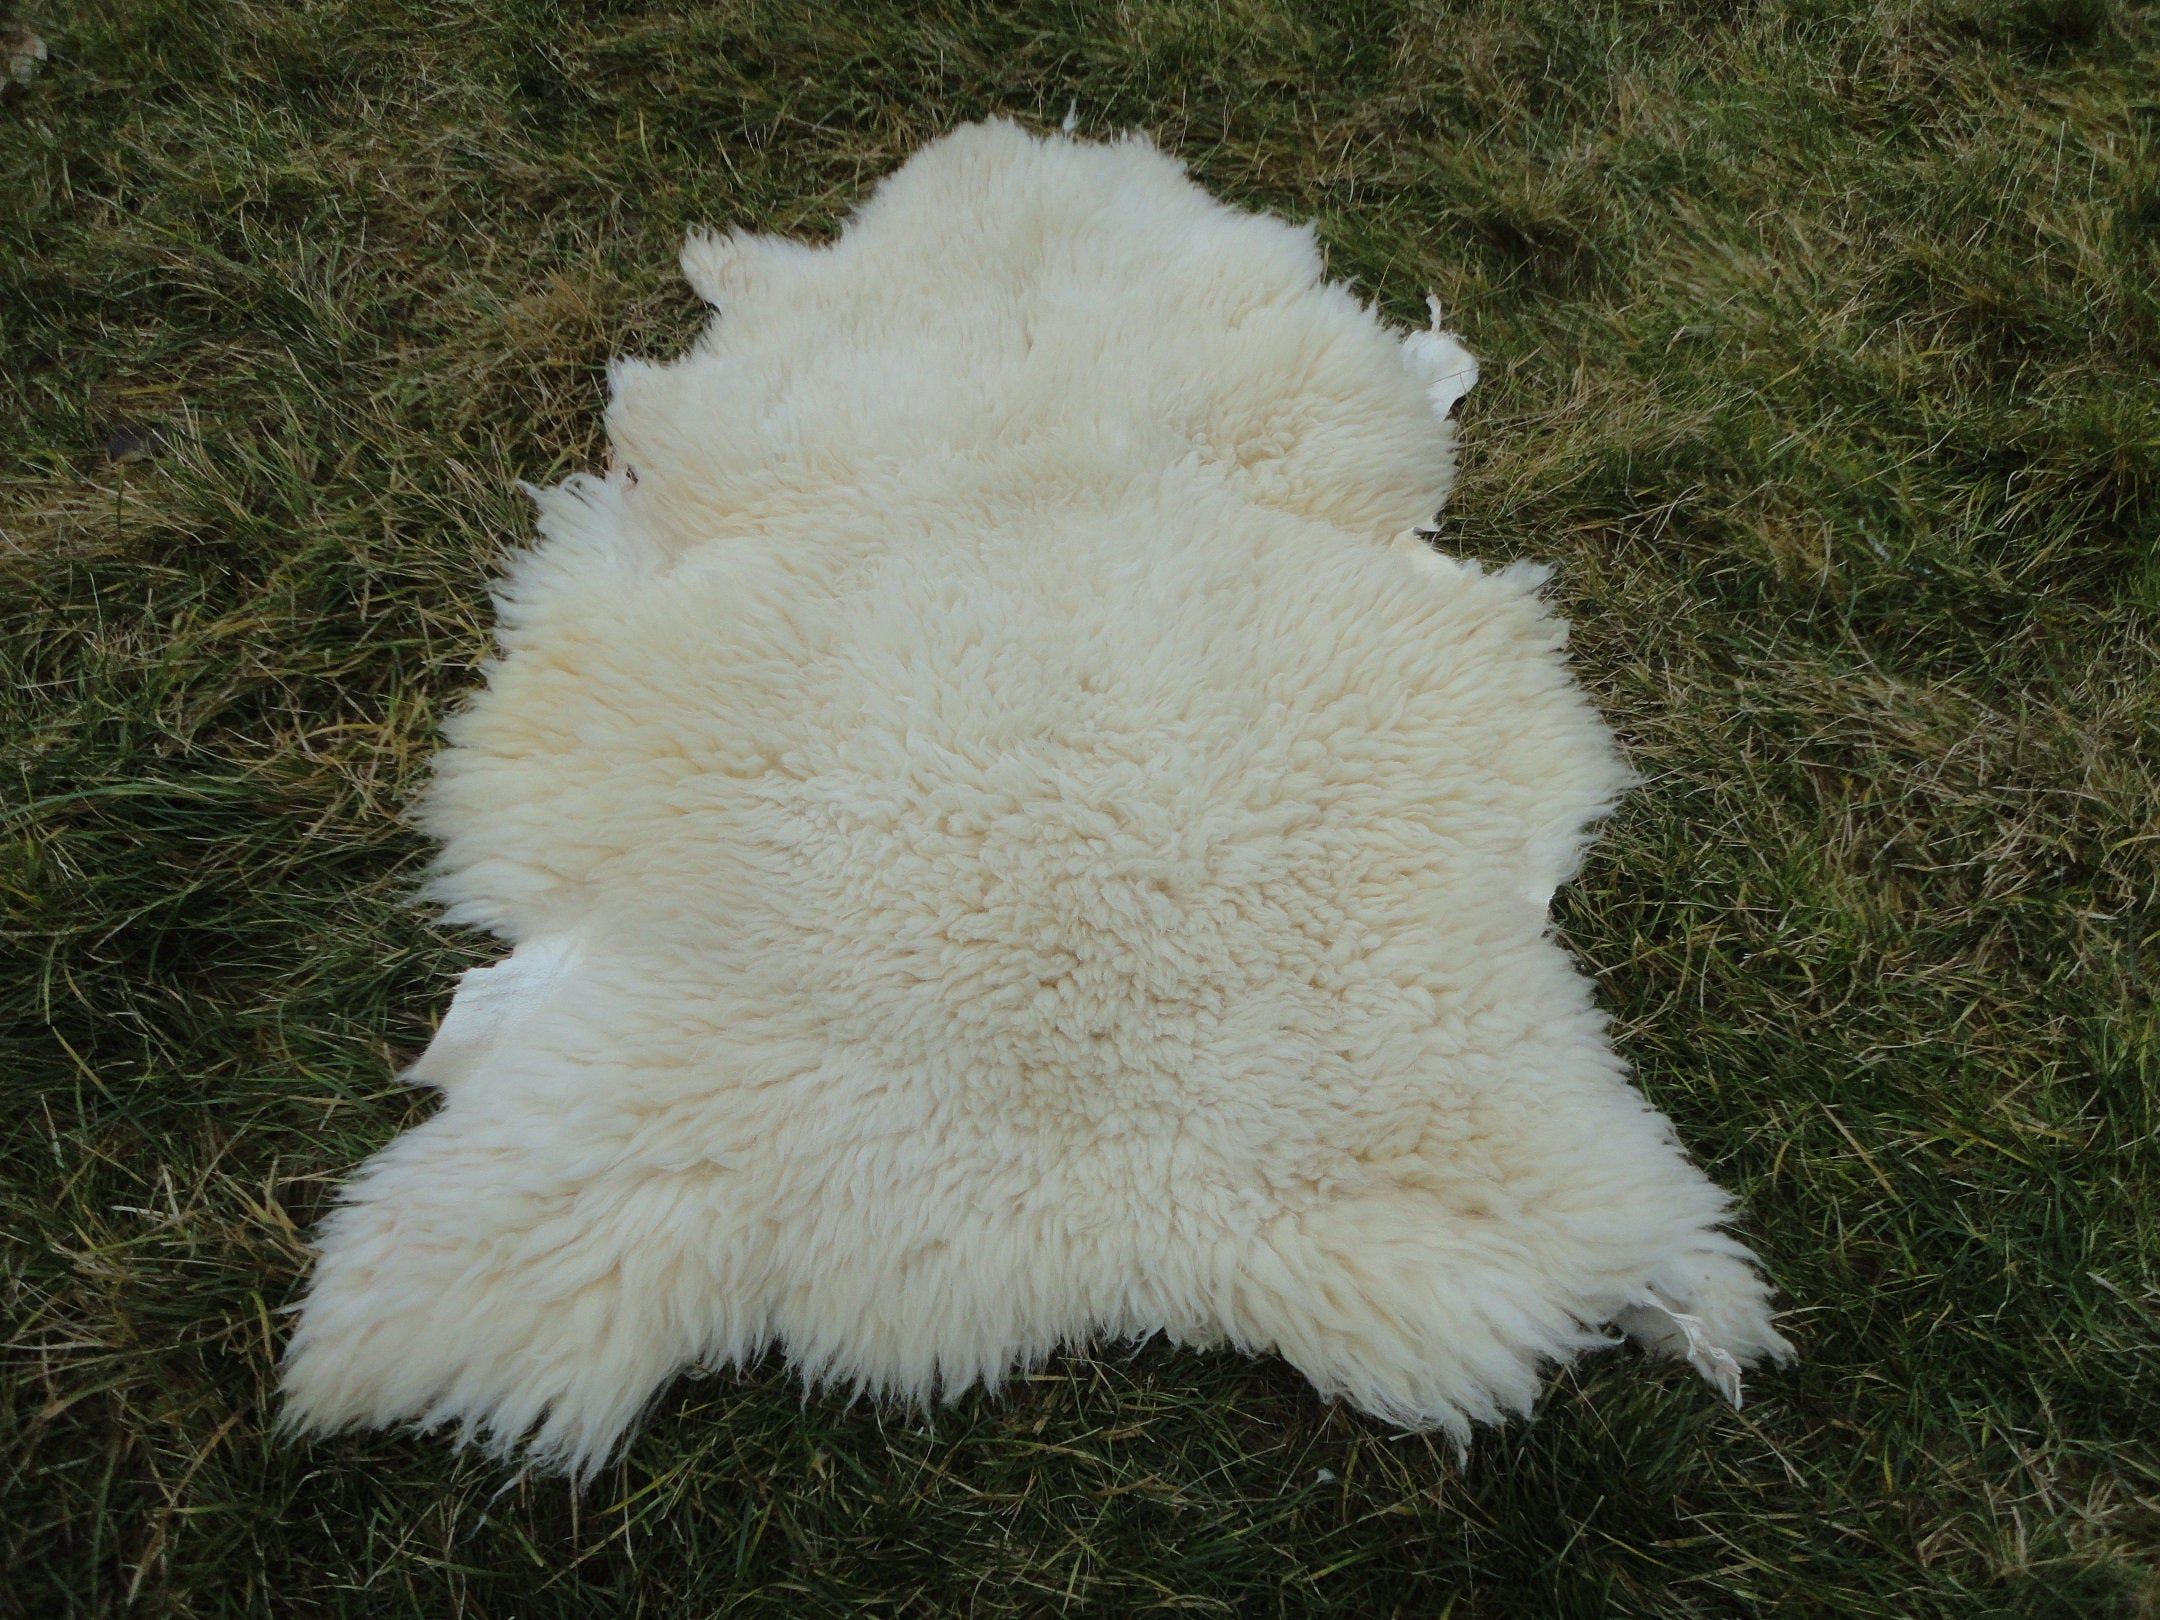 SheepSkin Rug,Natural sheep Skin Leather,Soft Animal Fur